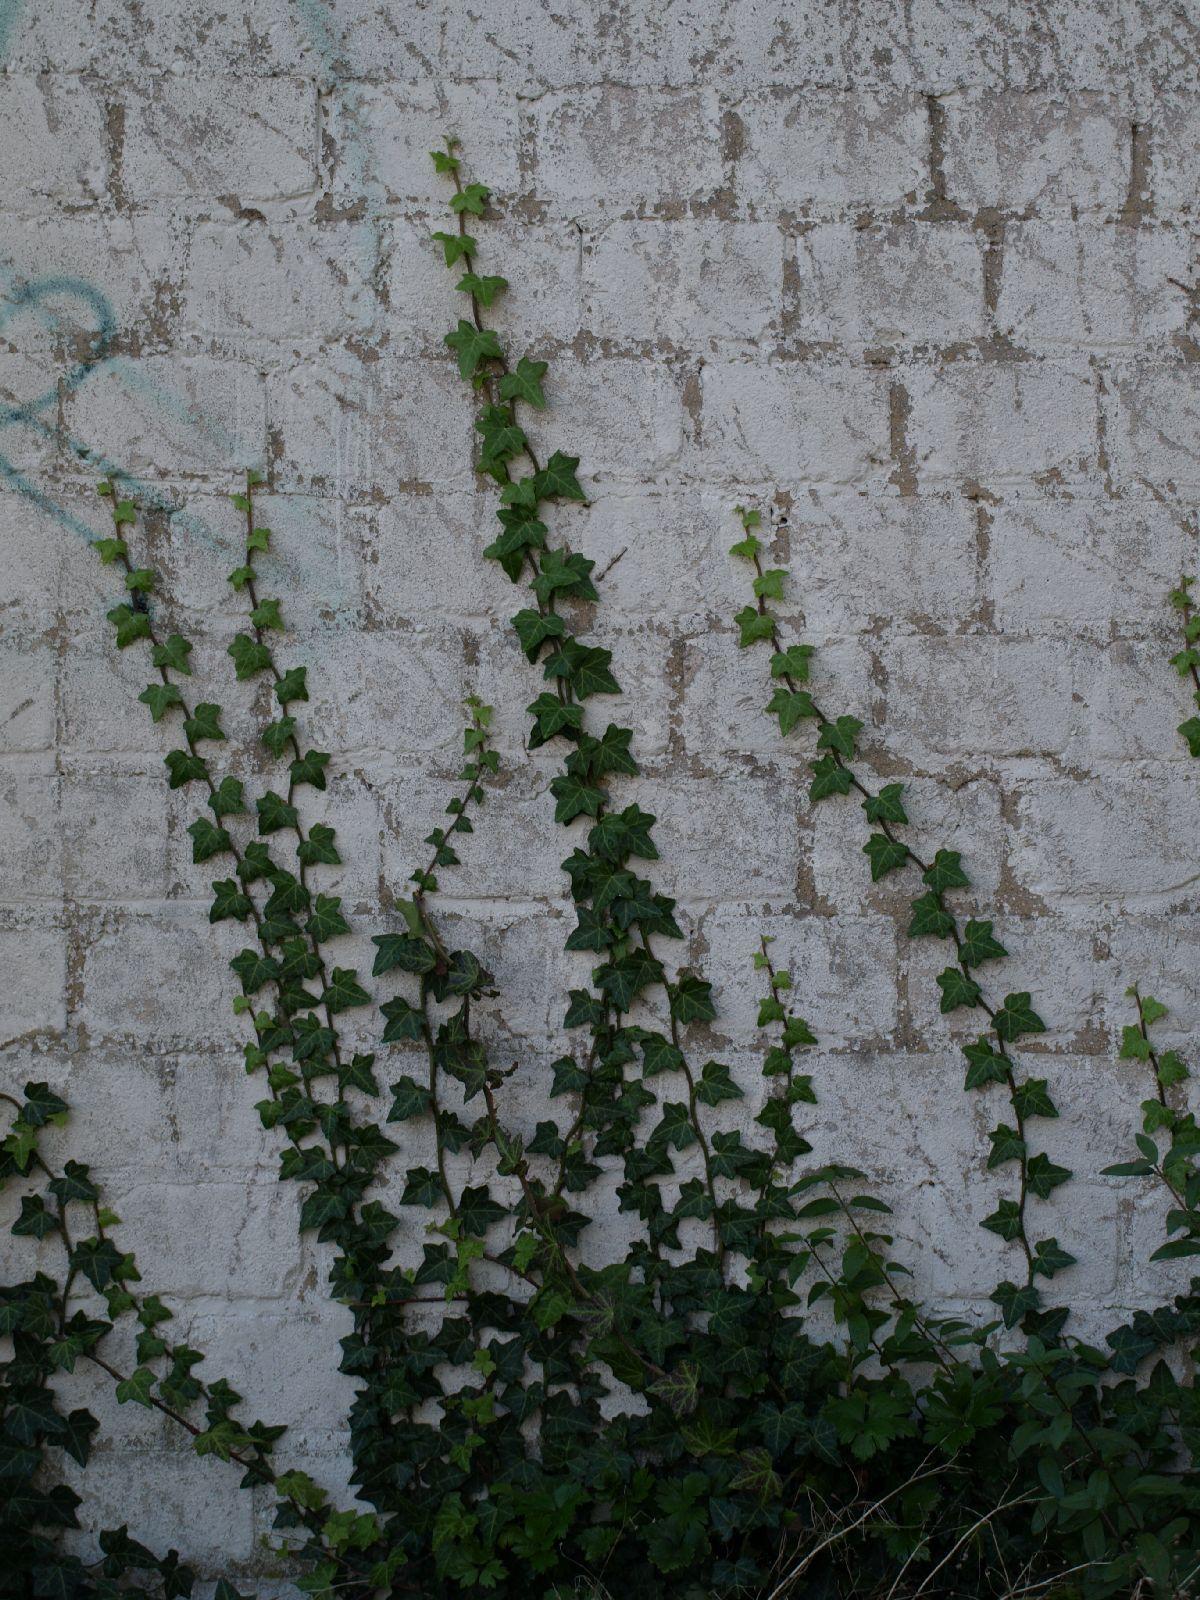 Pflanzen-Baum-Foto_Textur_B_PA035668